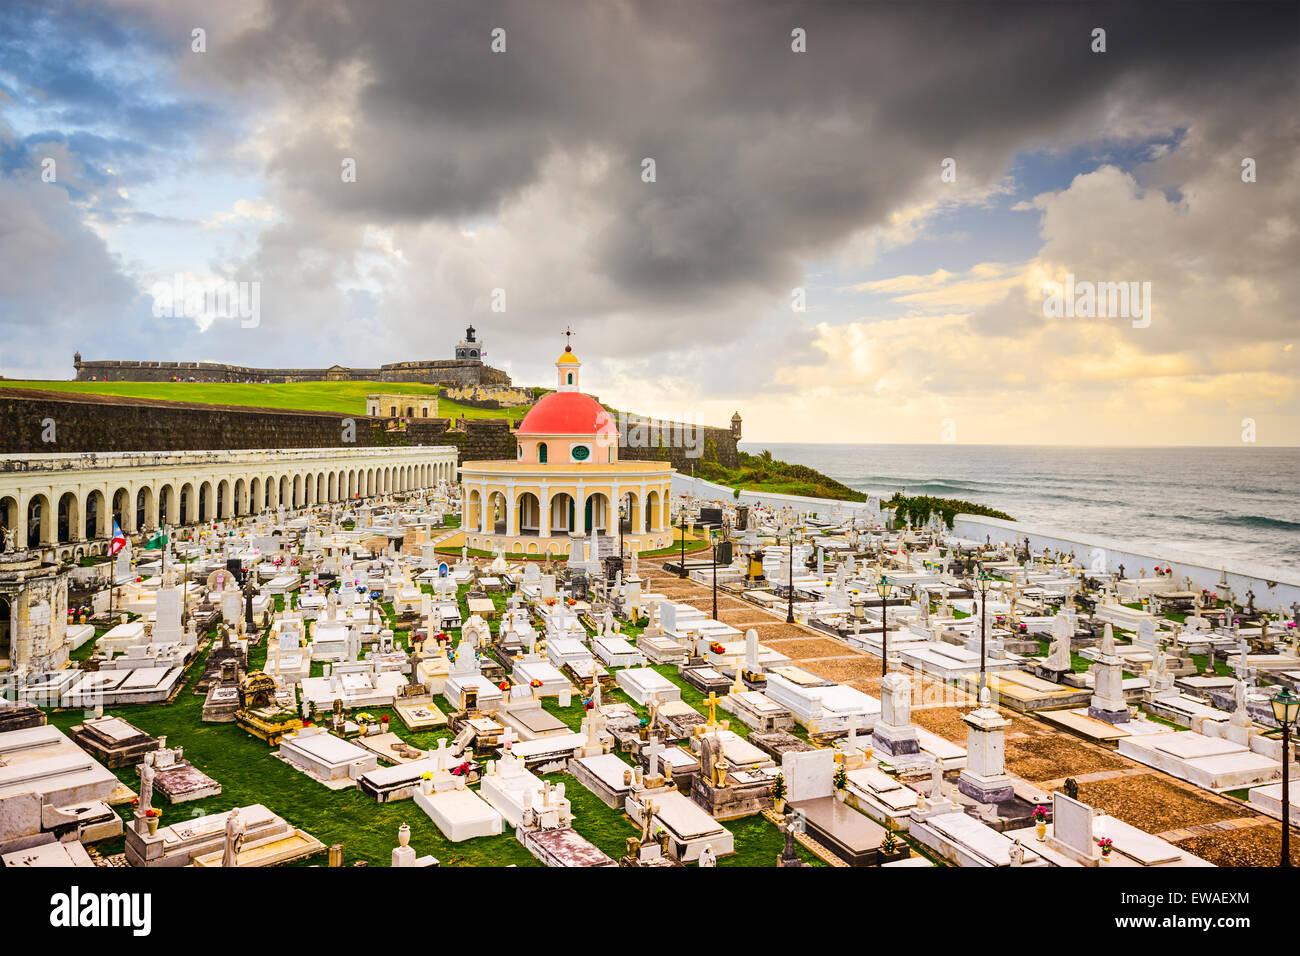 San Juan, Puerto Rico historischen Friedhof von Fort San Felipe Del Morro. Stockbild